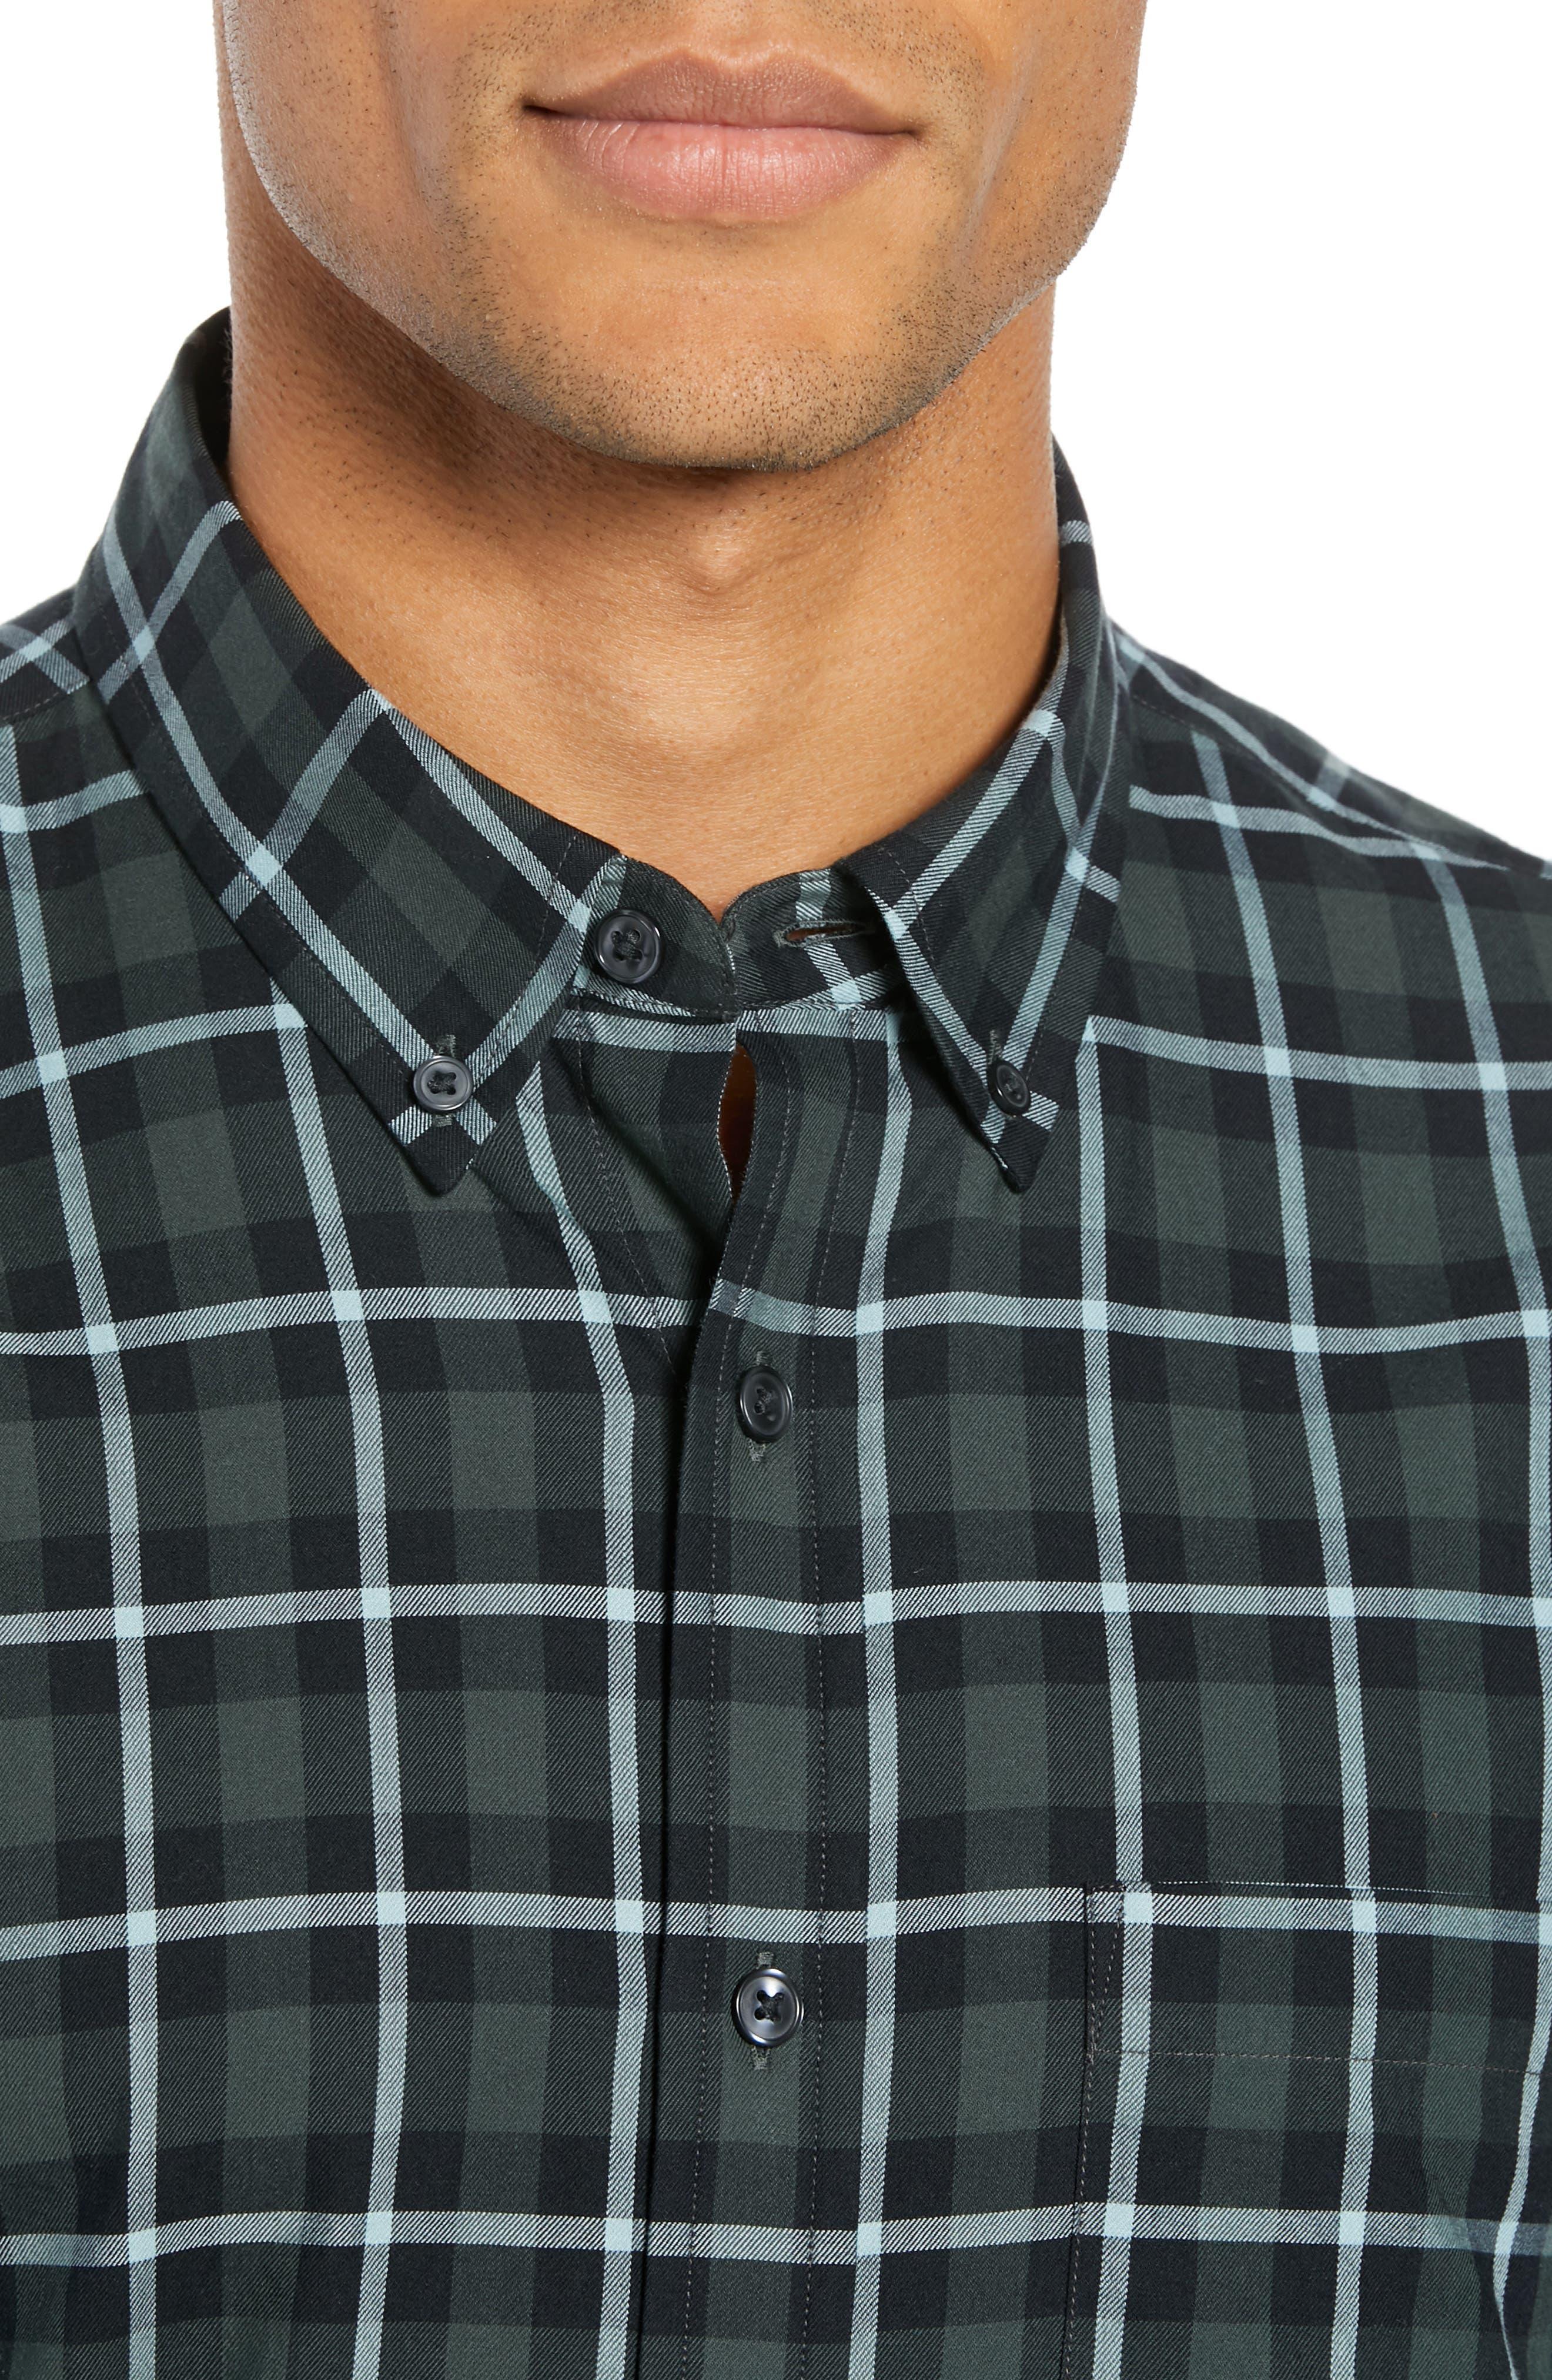 Trim Fit Plaid Sport Shirt,                             Alternate thumbnail 2, color,                             NAVY MULTI